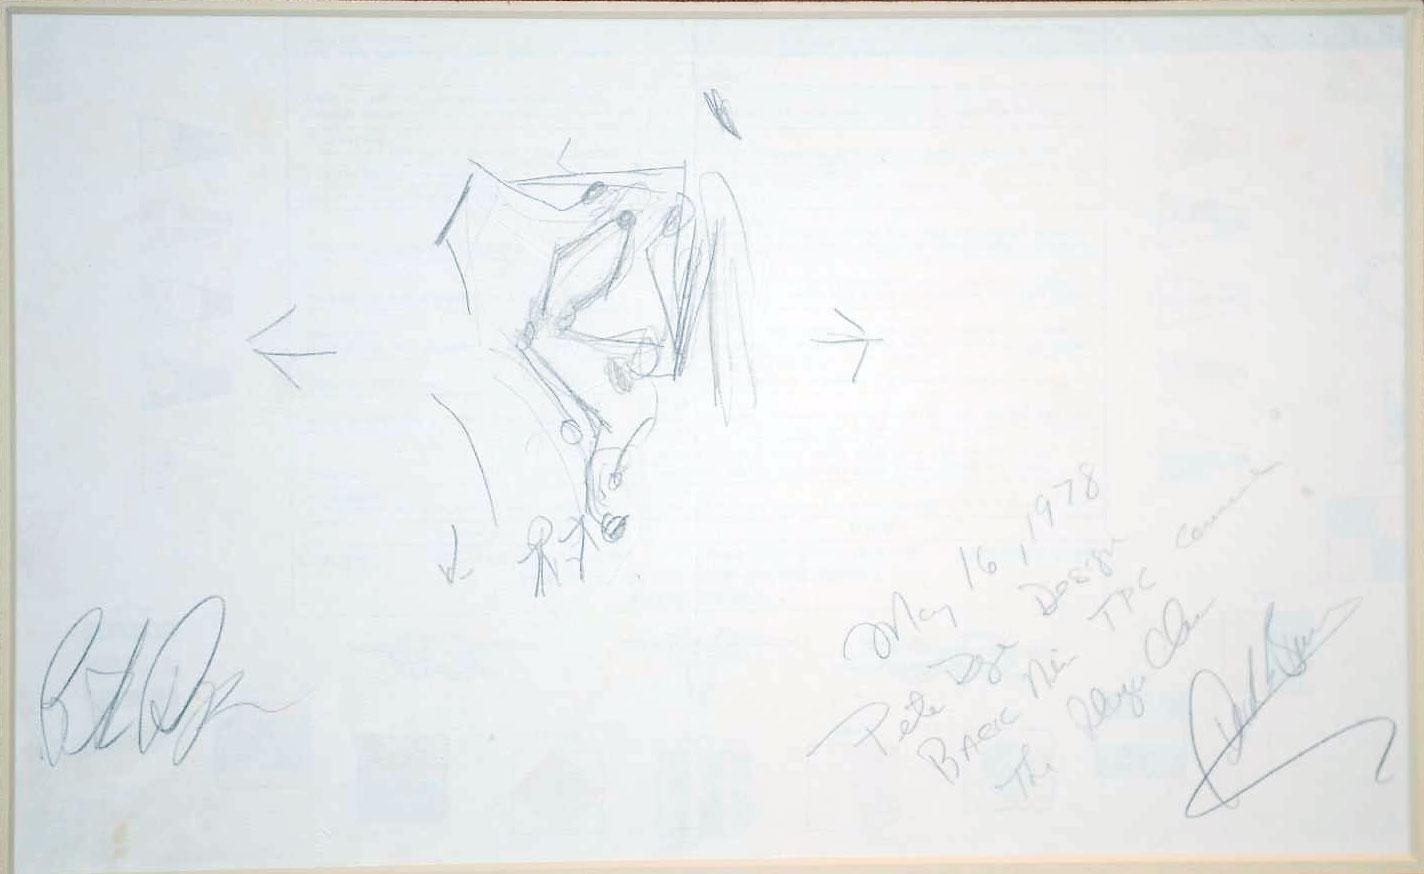 Pete Dye's original sketch of the back nine at TPC Sawgrass.